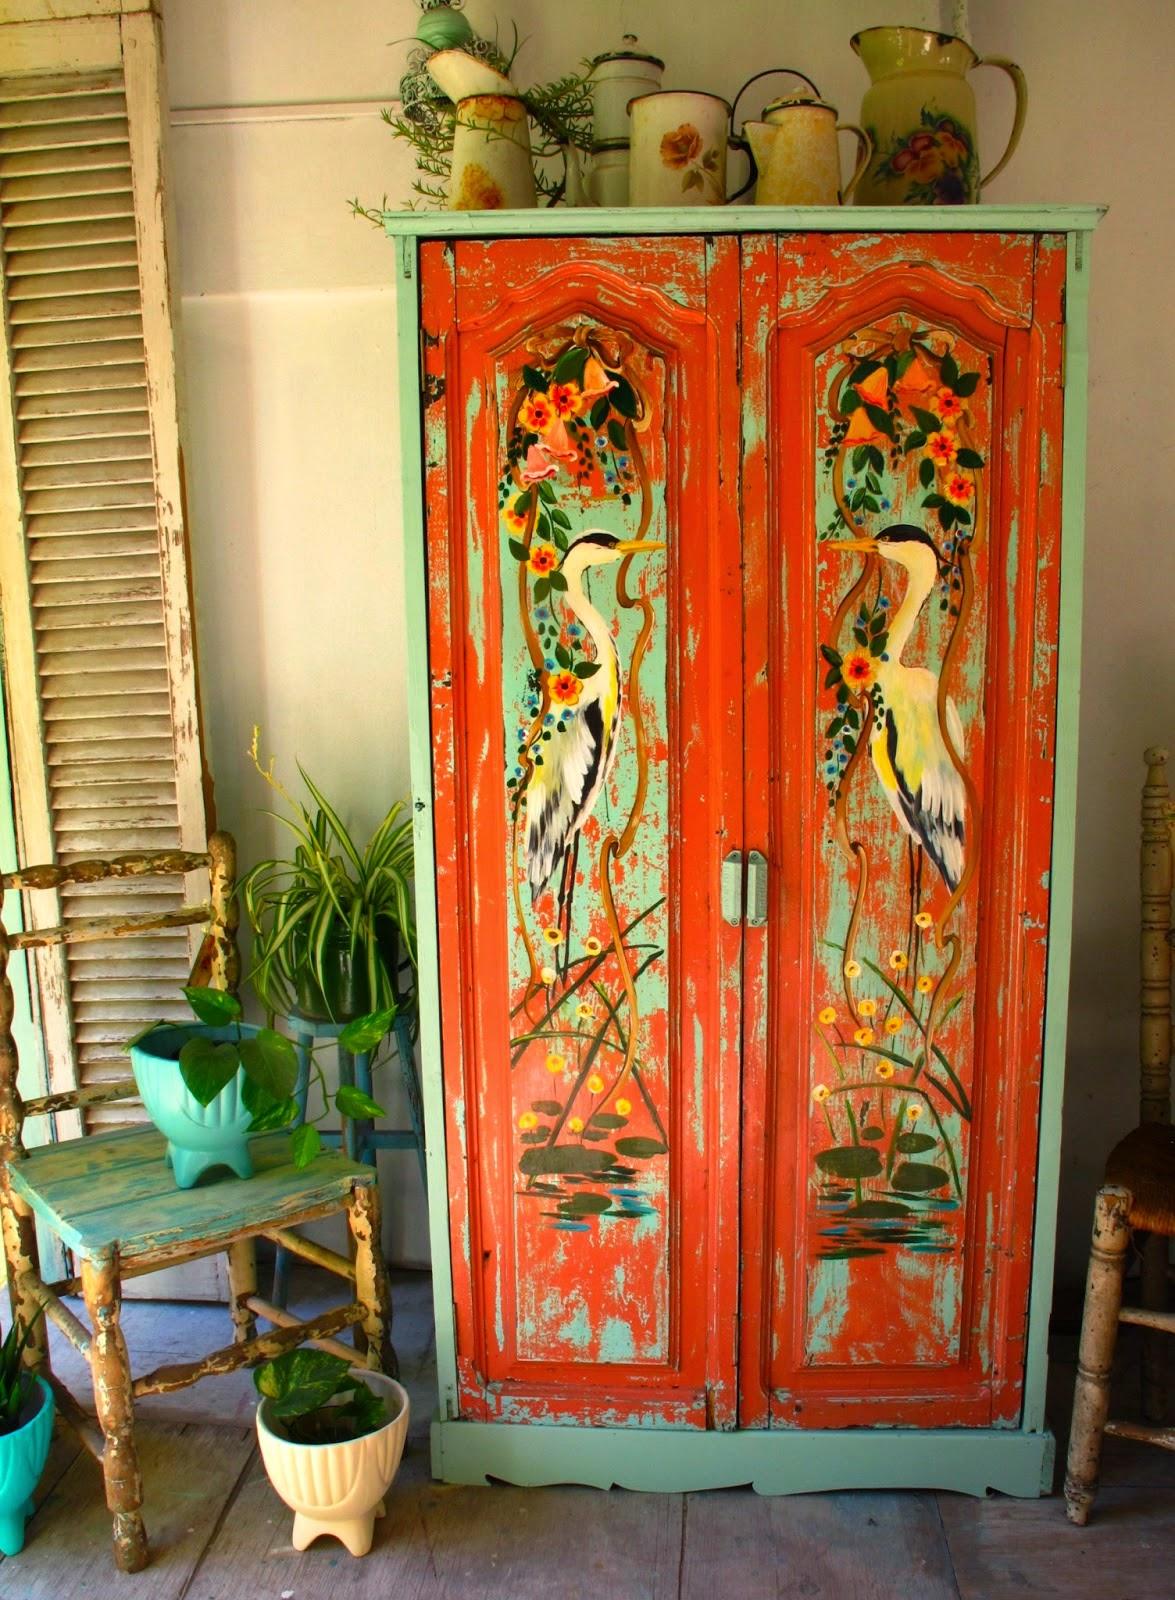 Repagina o de m veis em estilo vintage jeito de casa - Armarios pintados a mano ...